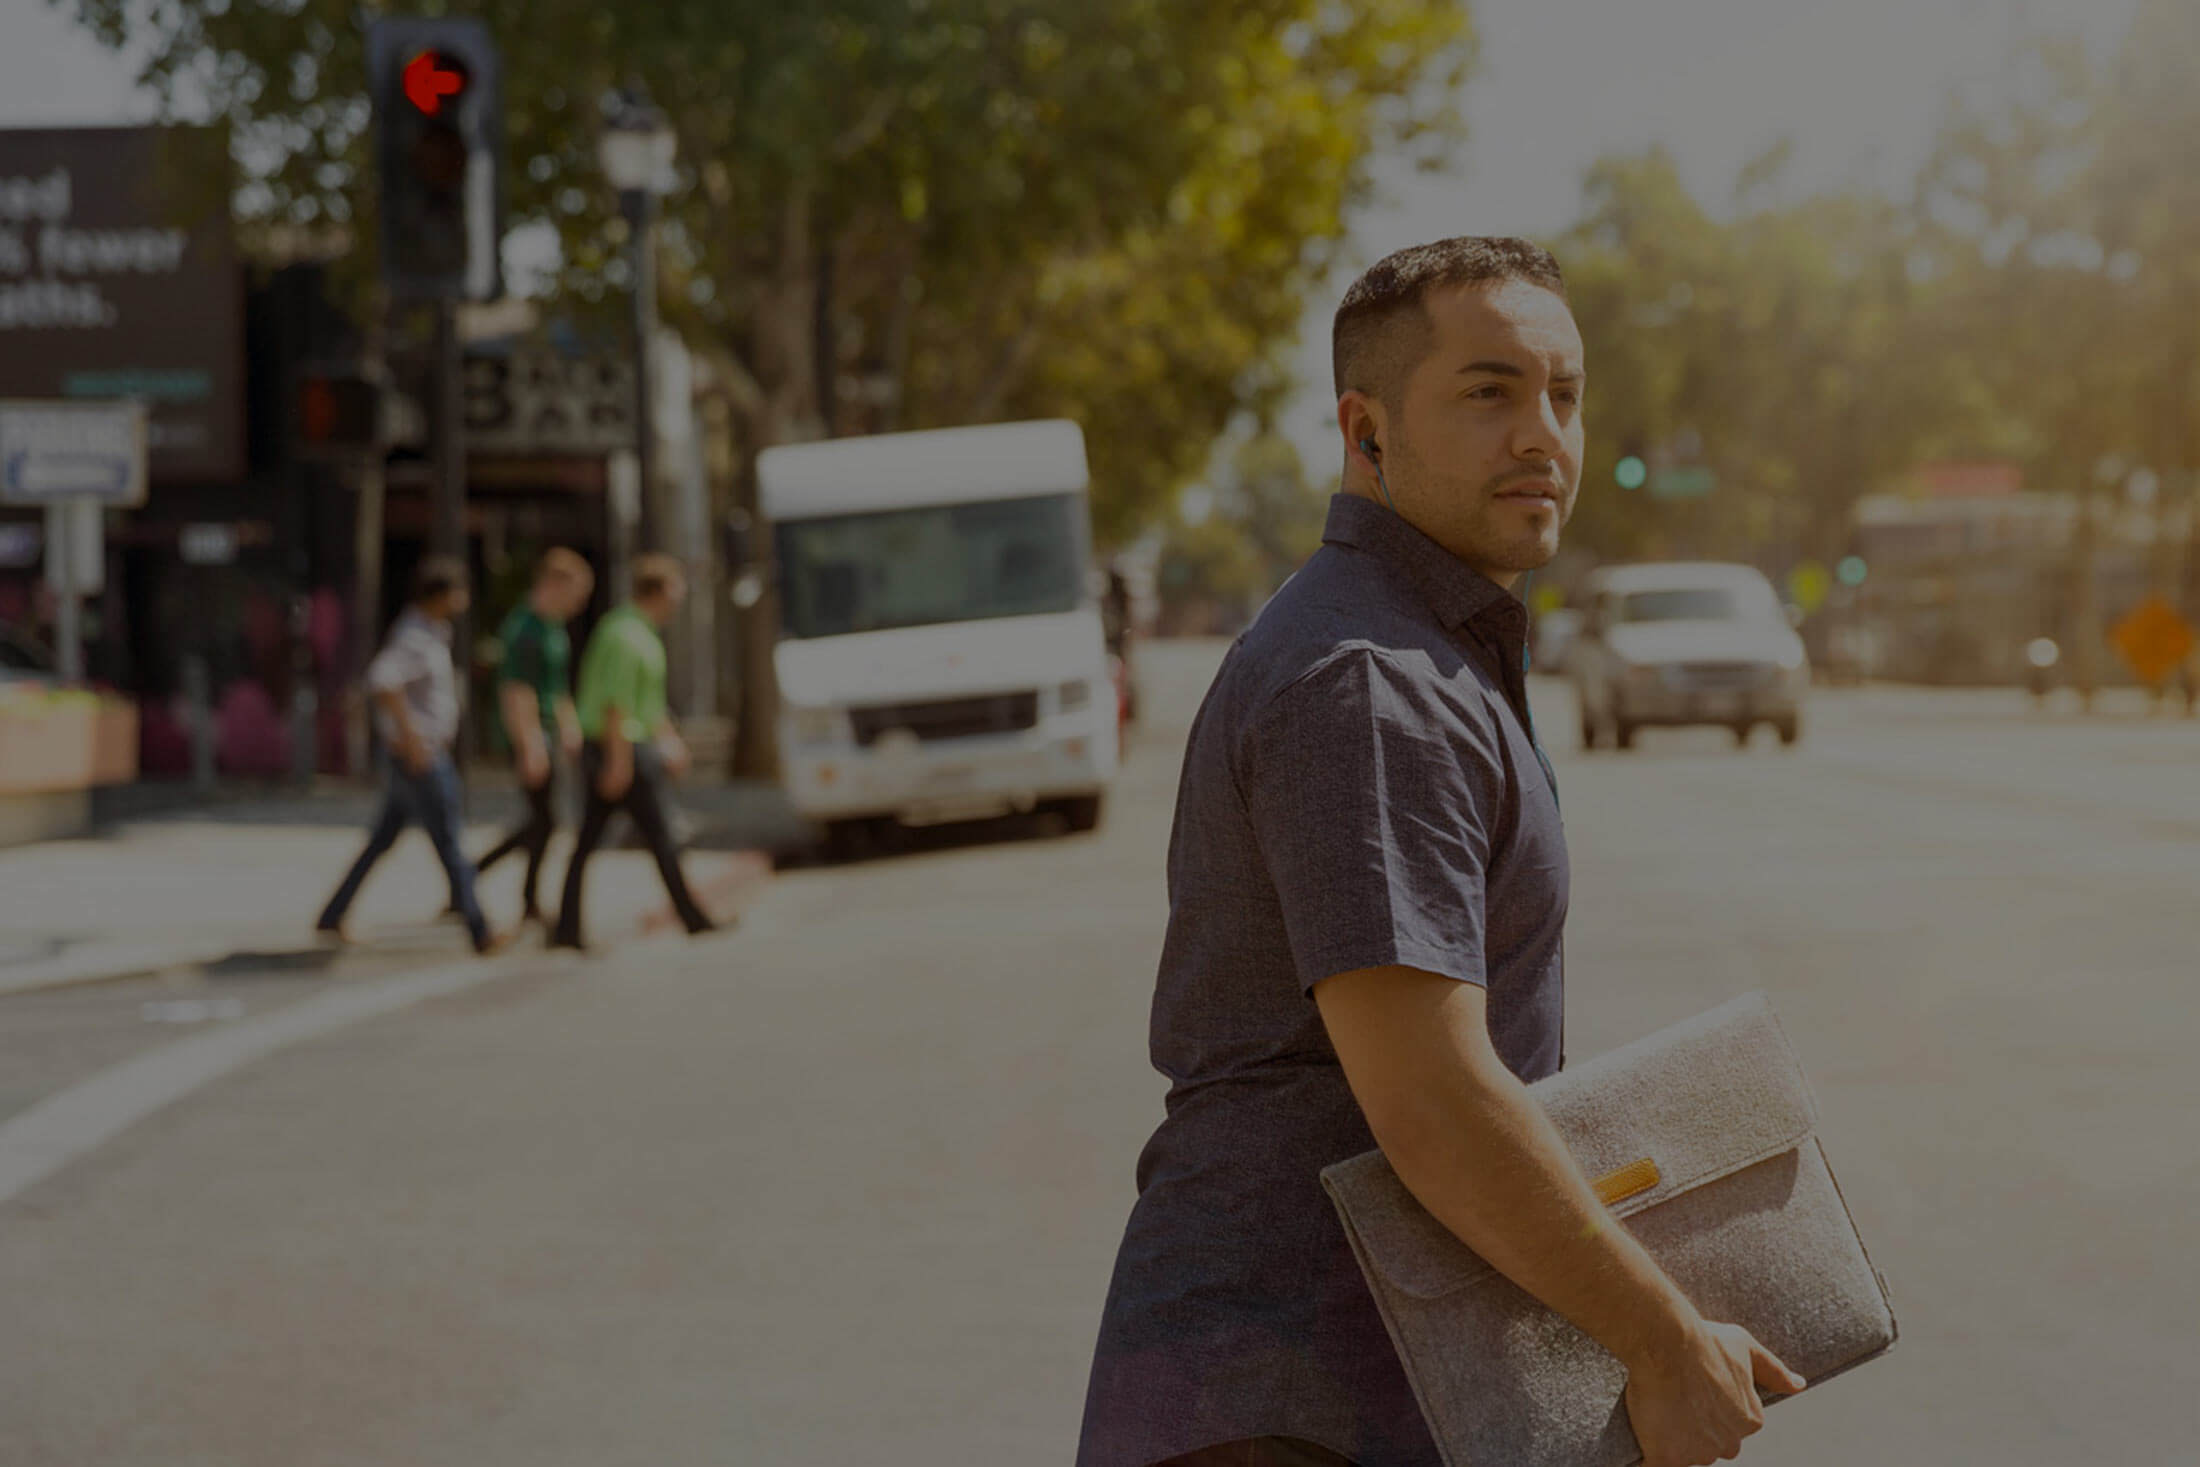 Pole emploi - offre emploi Automaticien pose de portail (H/F) - Juillan